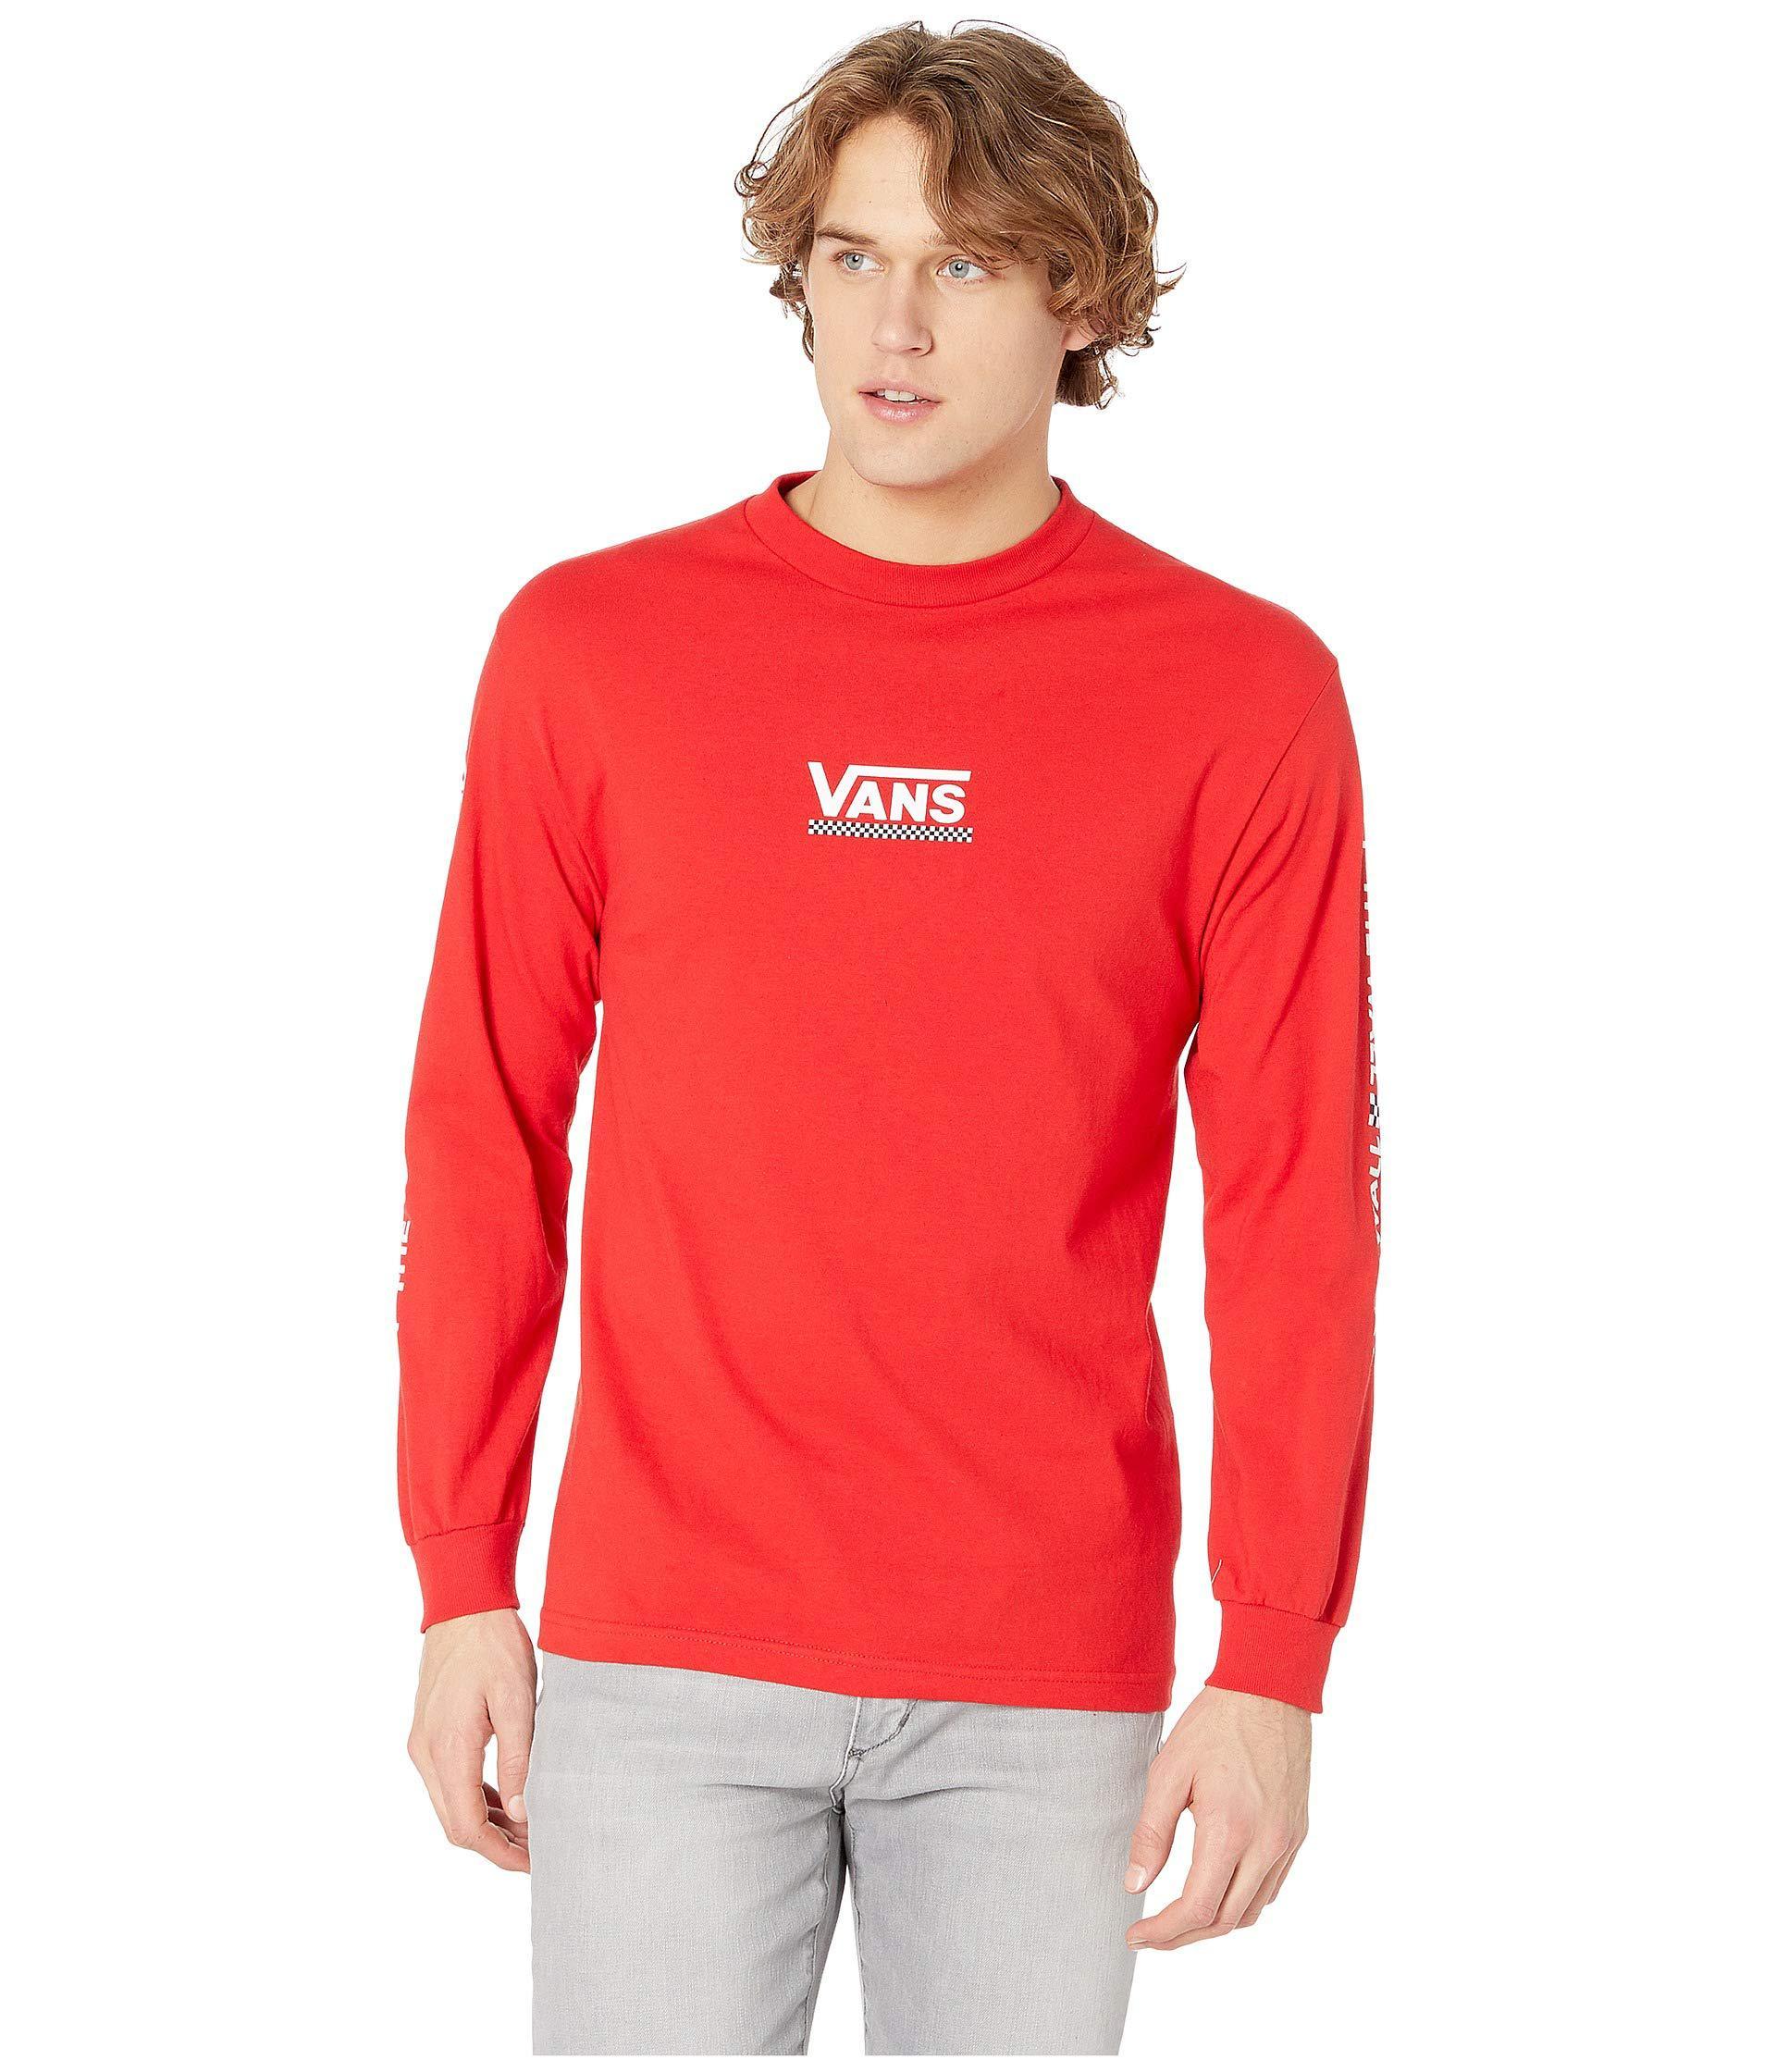 3e57da317621 Lyst - Vans Checkmate Iii Long Sleeve T-shirt (racing Red) Men's ...